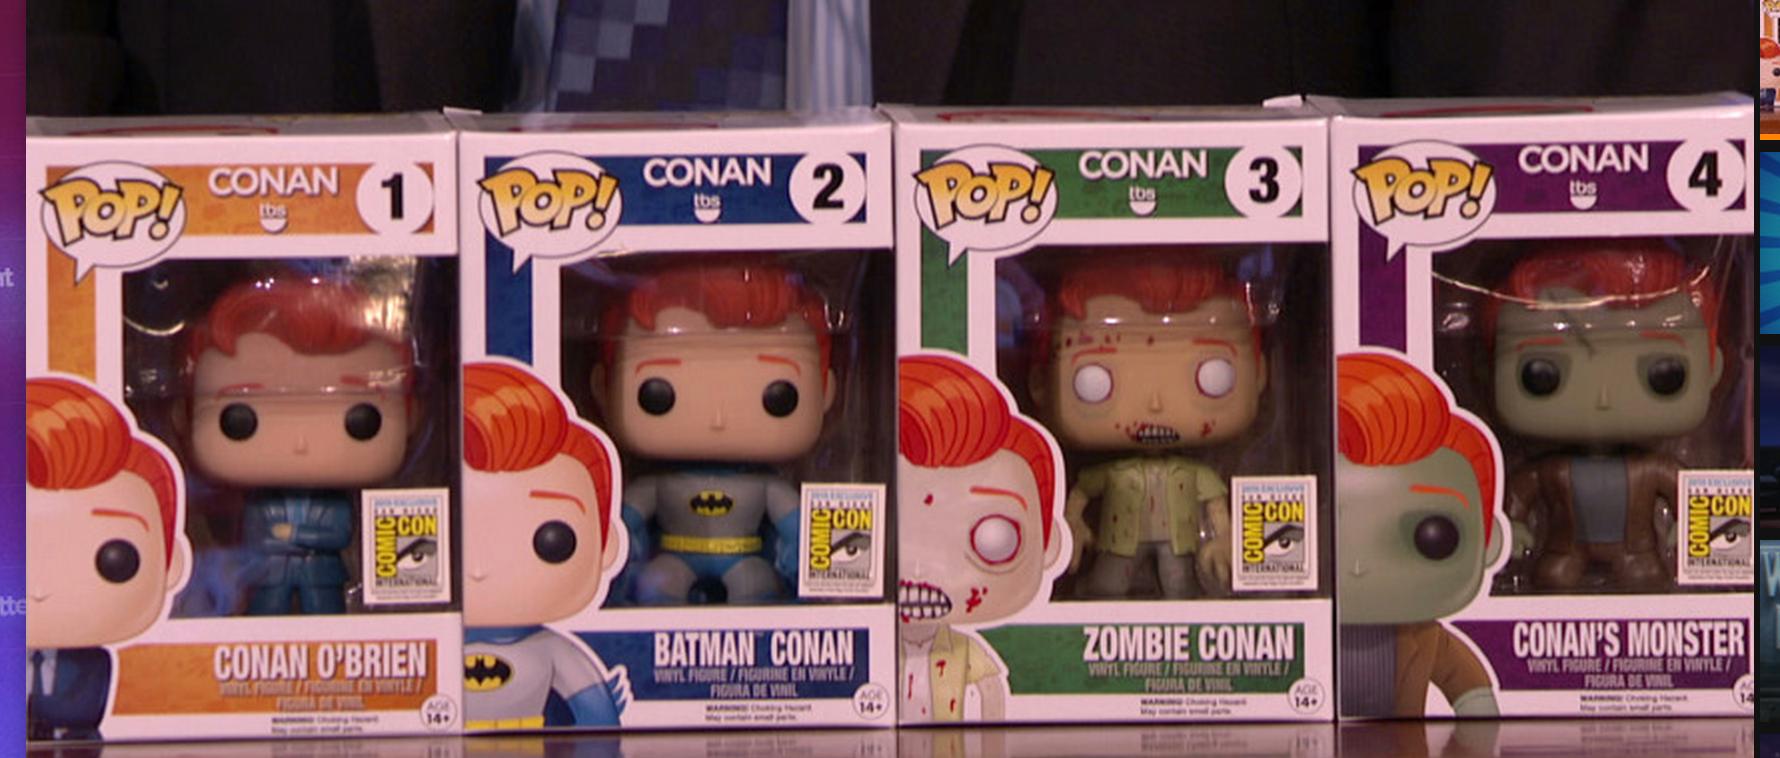 Conan O Brien Funko Pop Vinyls Are Coming Soon